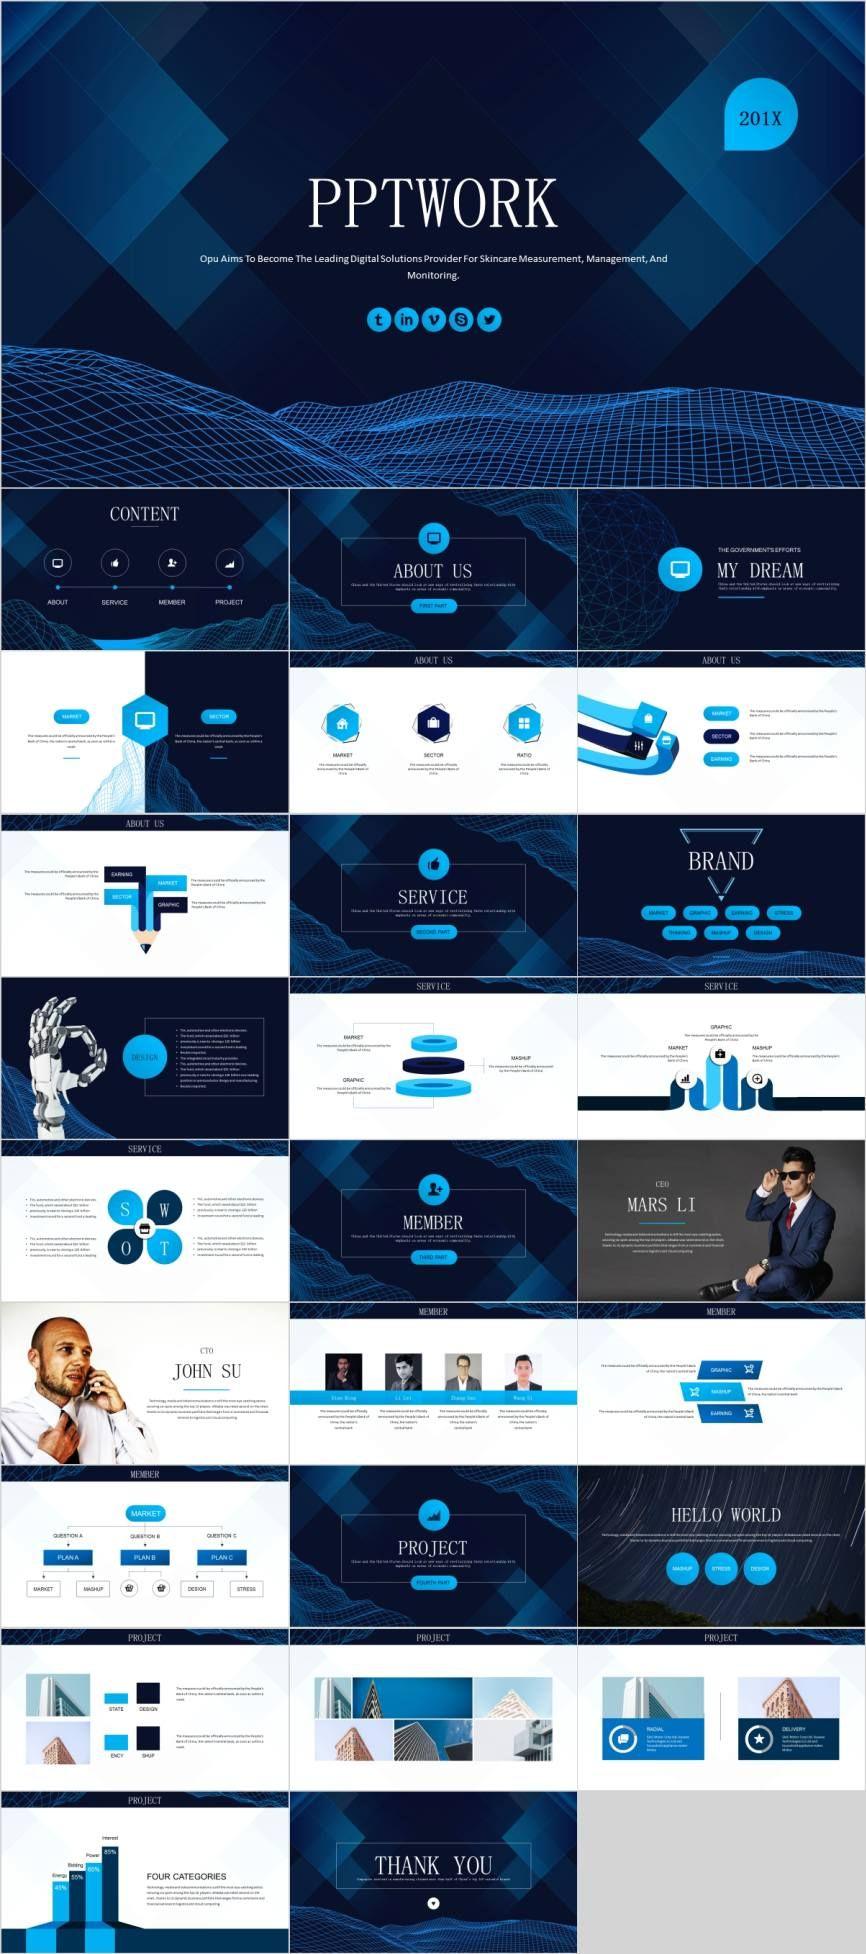 Best Blue Report Ideas Design Powerpoint Template Pcslide Com Presentation Fa Powerpoint Design Templates Powerpoint Templates Business Powerpoint Templates